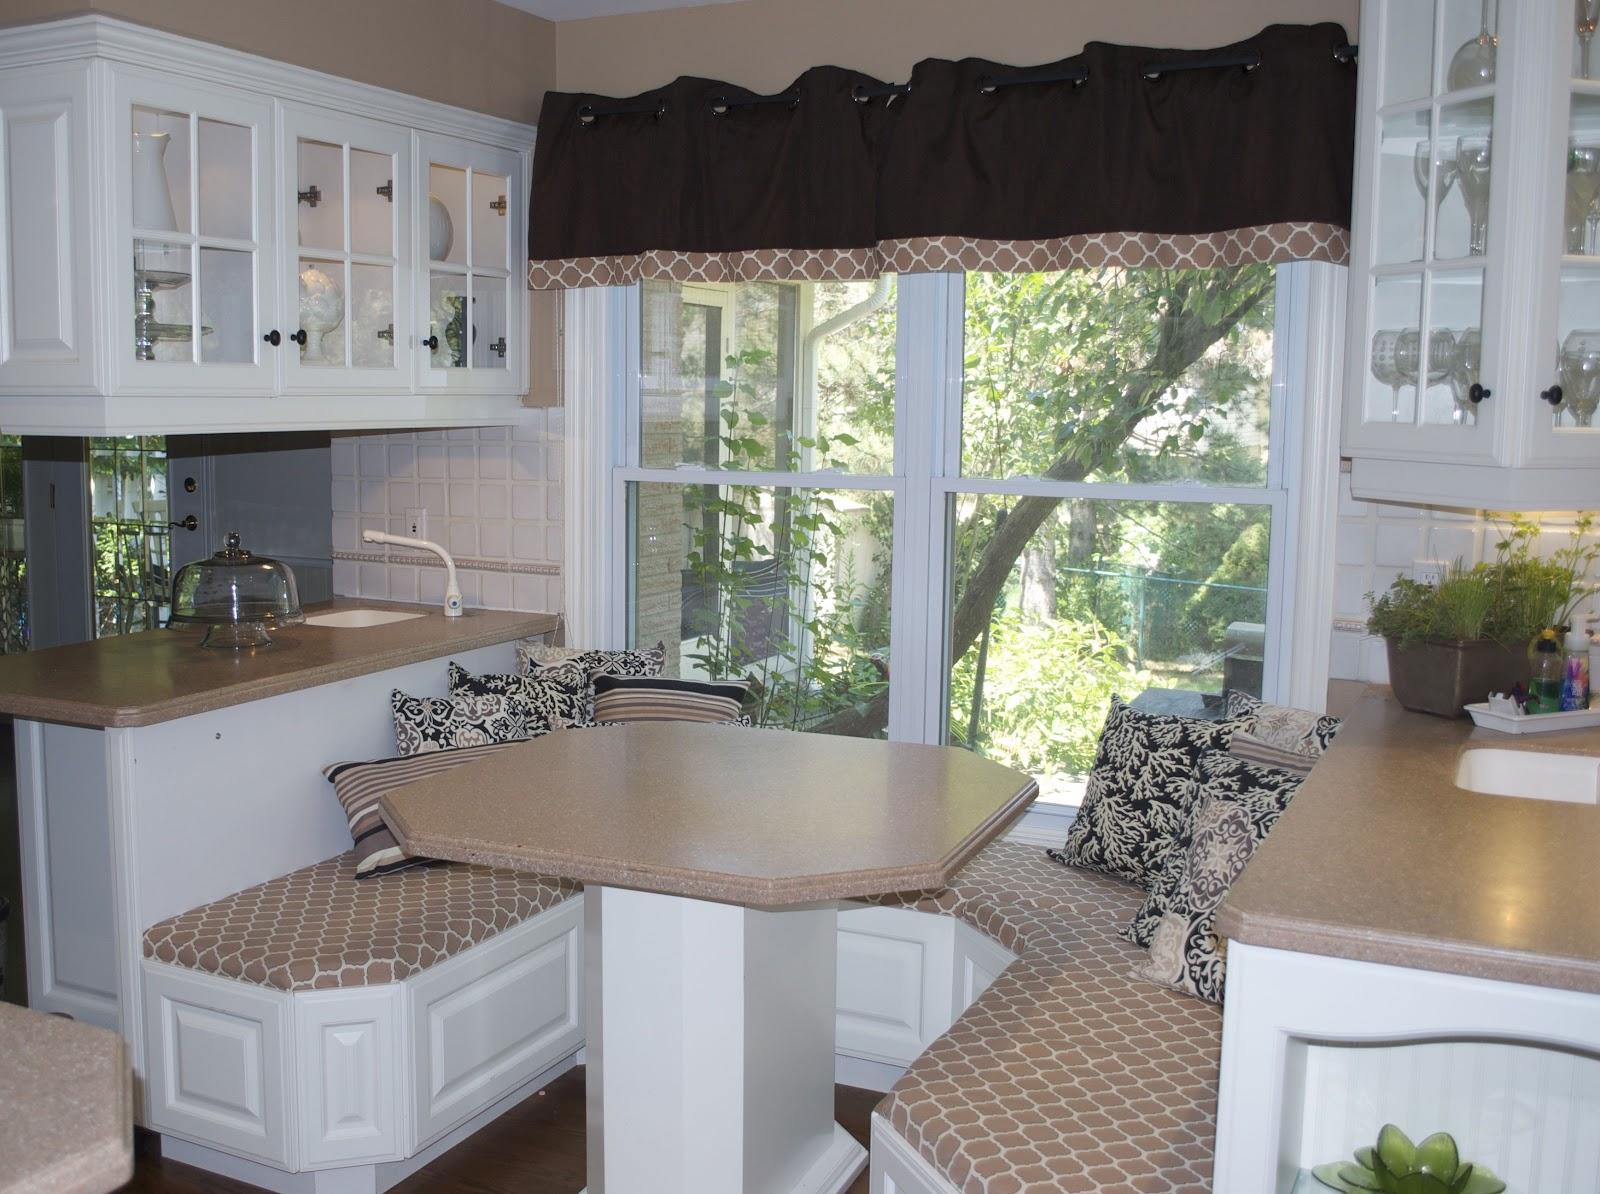 My House. My Canvas.: DIY Kitchen Banquette